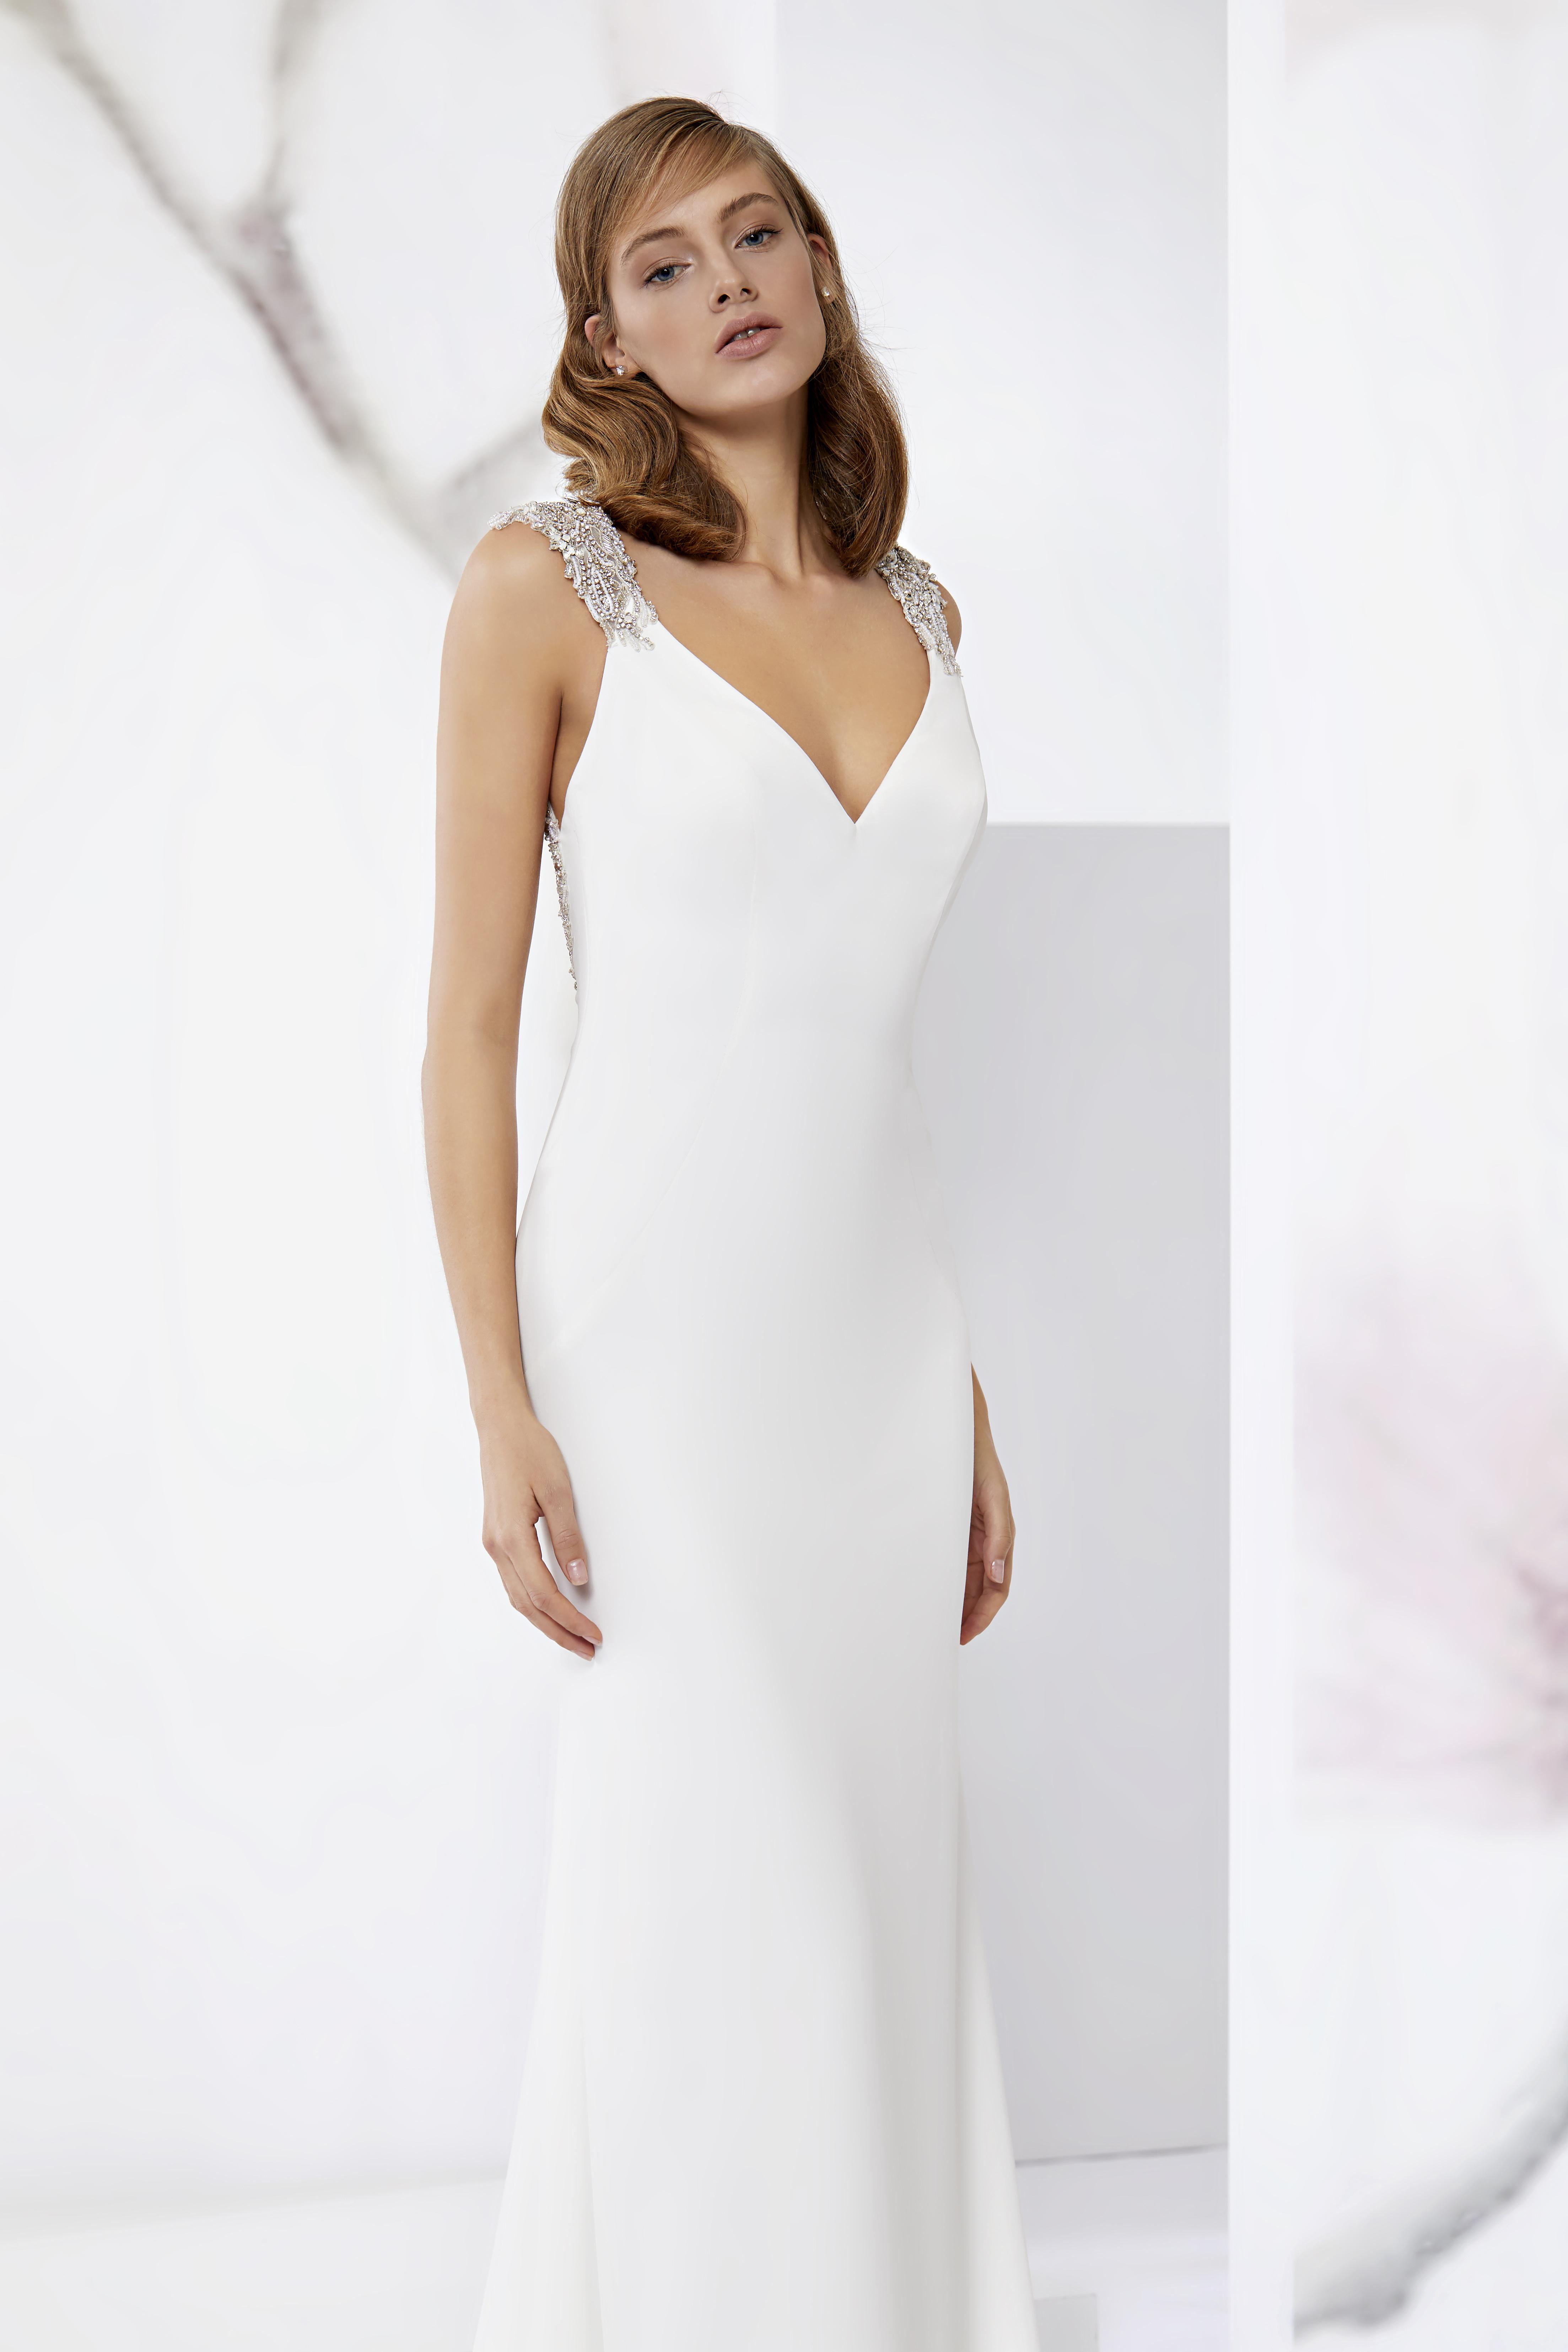 Nicole Milano collection Jolies 25611